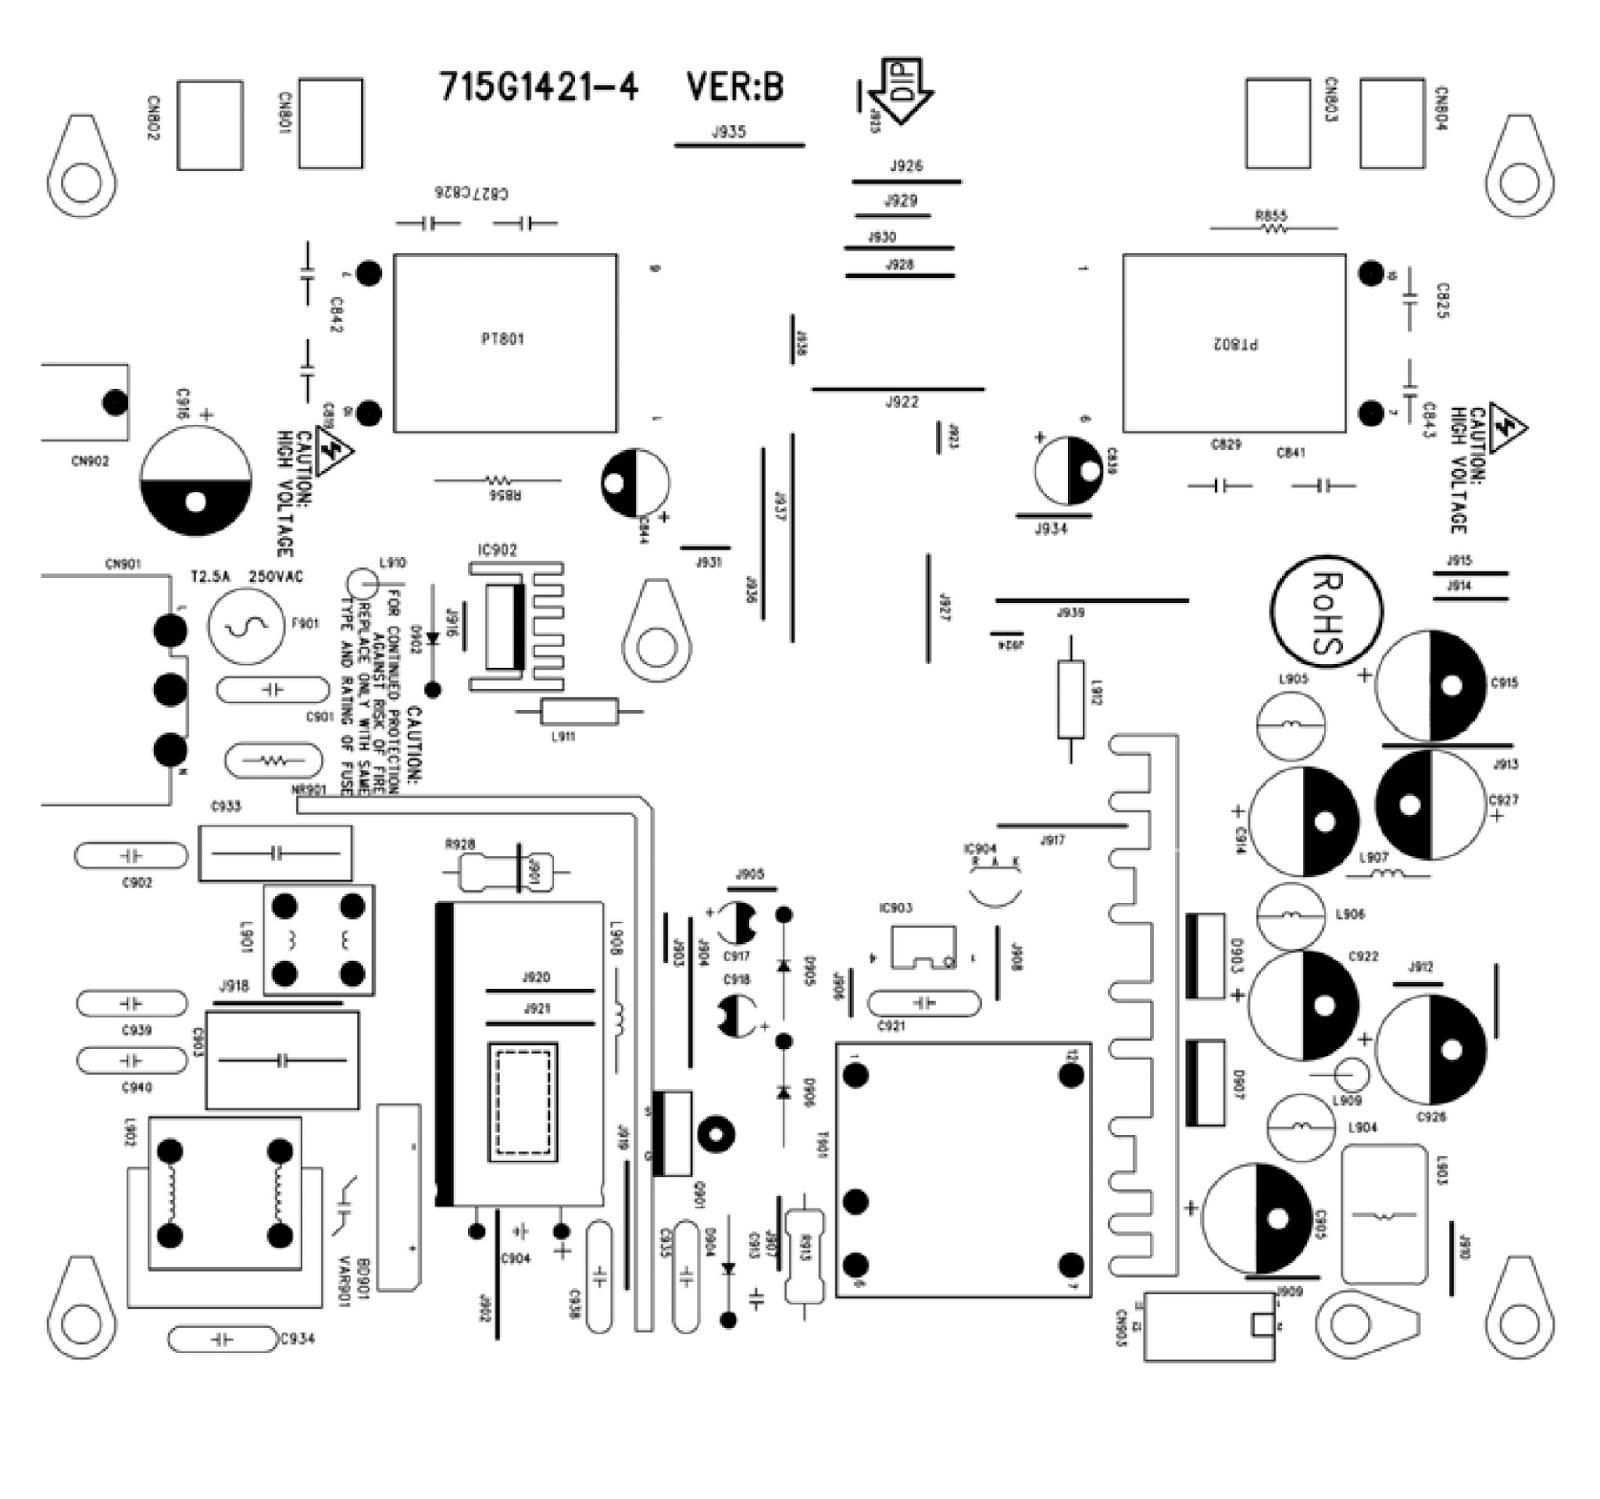 lcd monitor schematic diagram